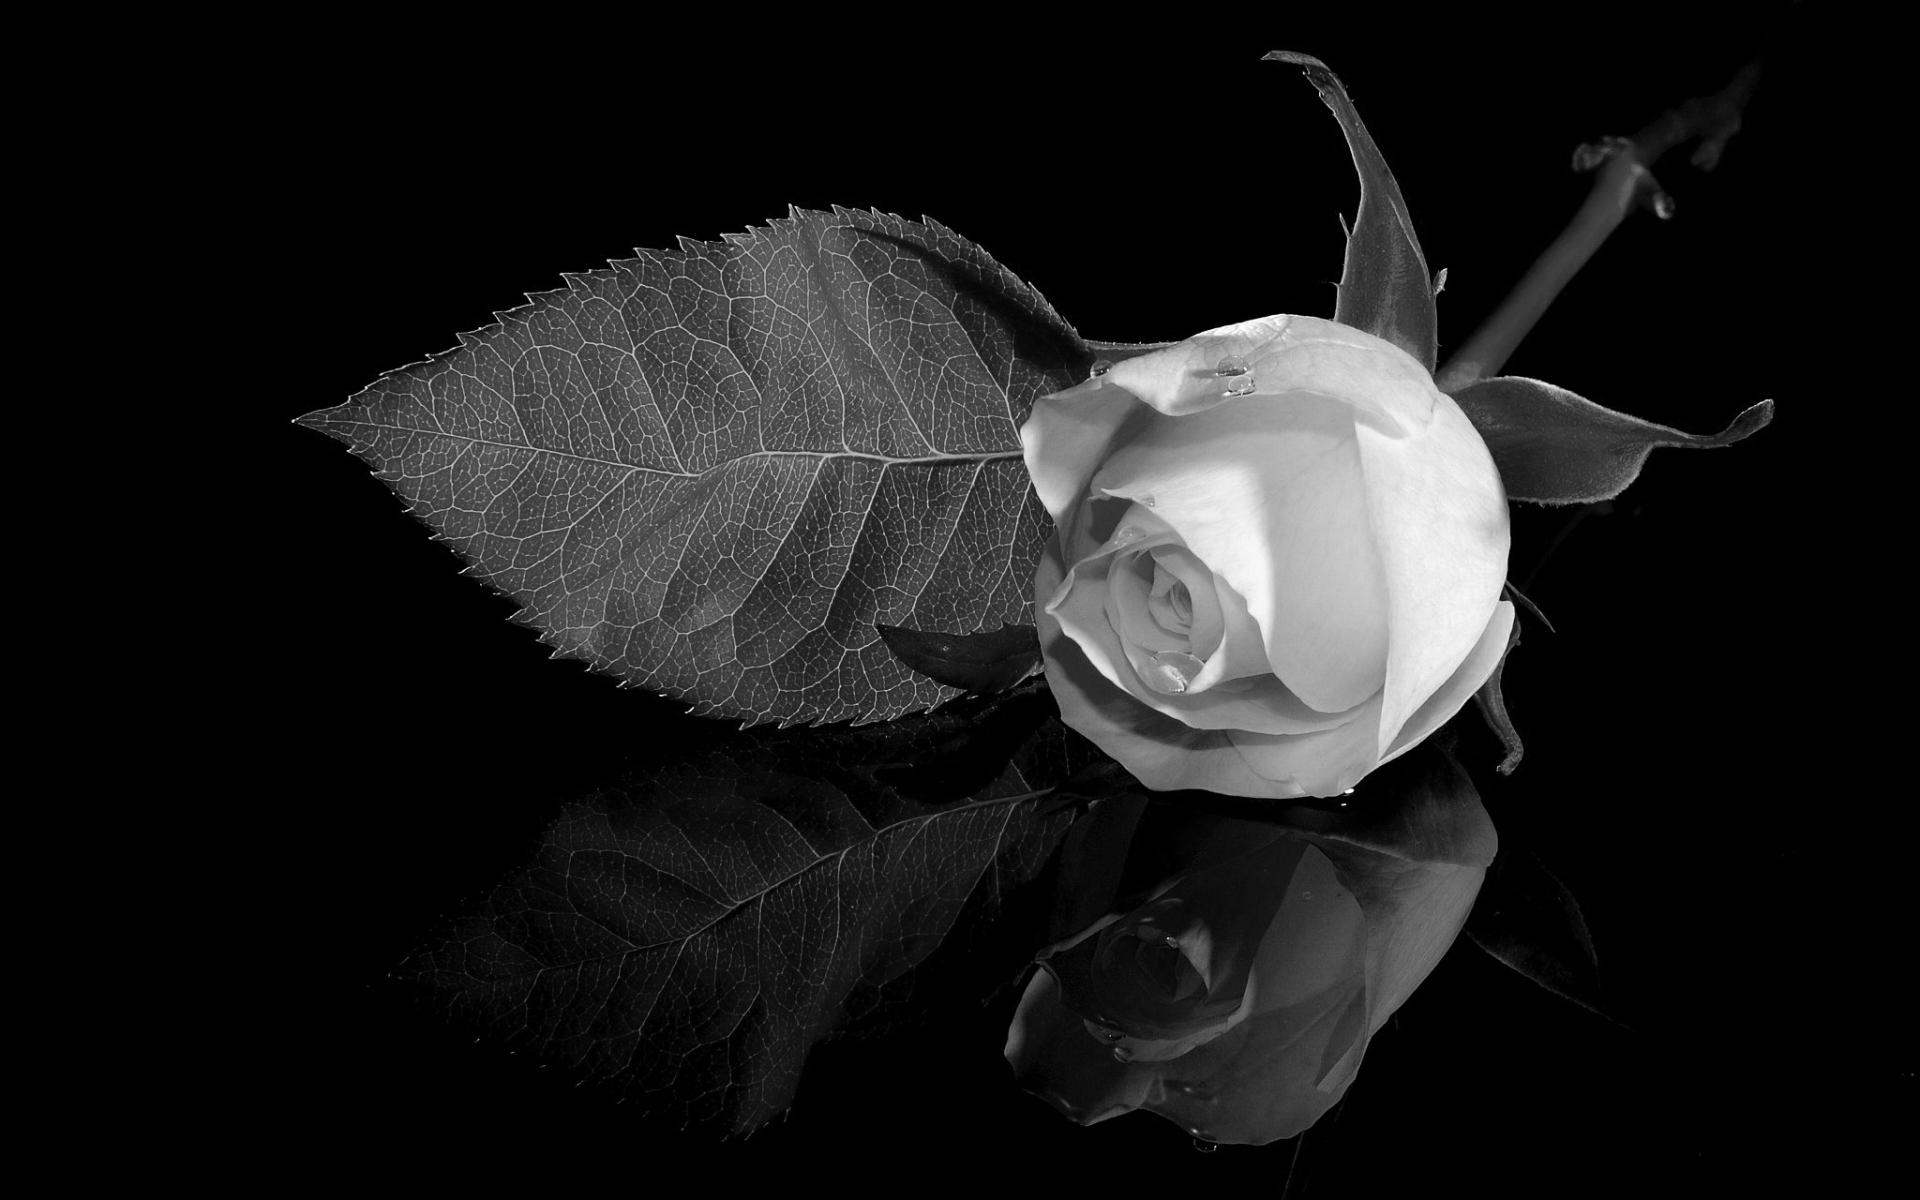 Черно-белая роза картинка